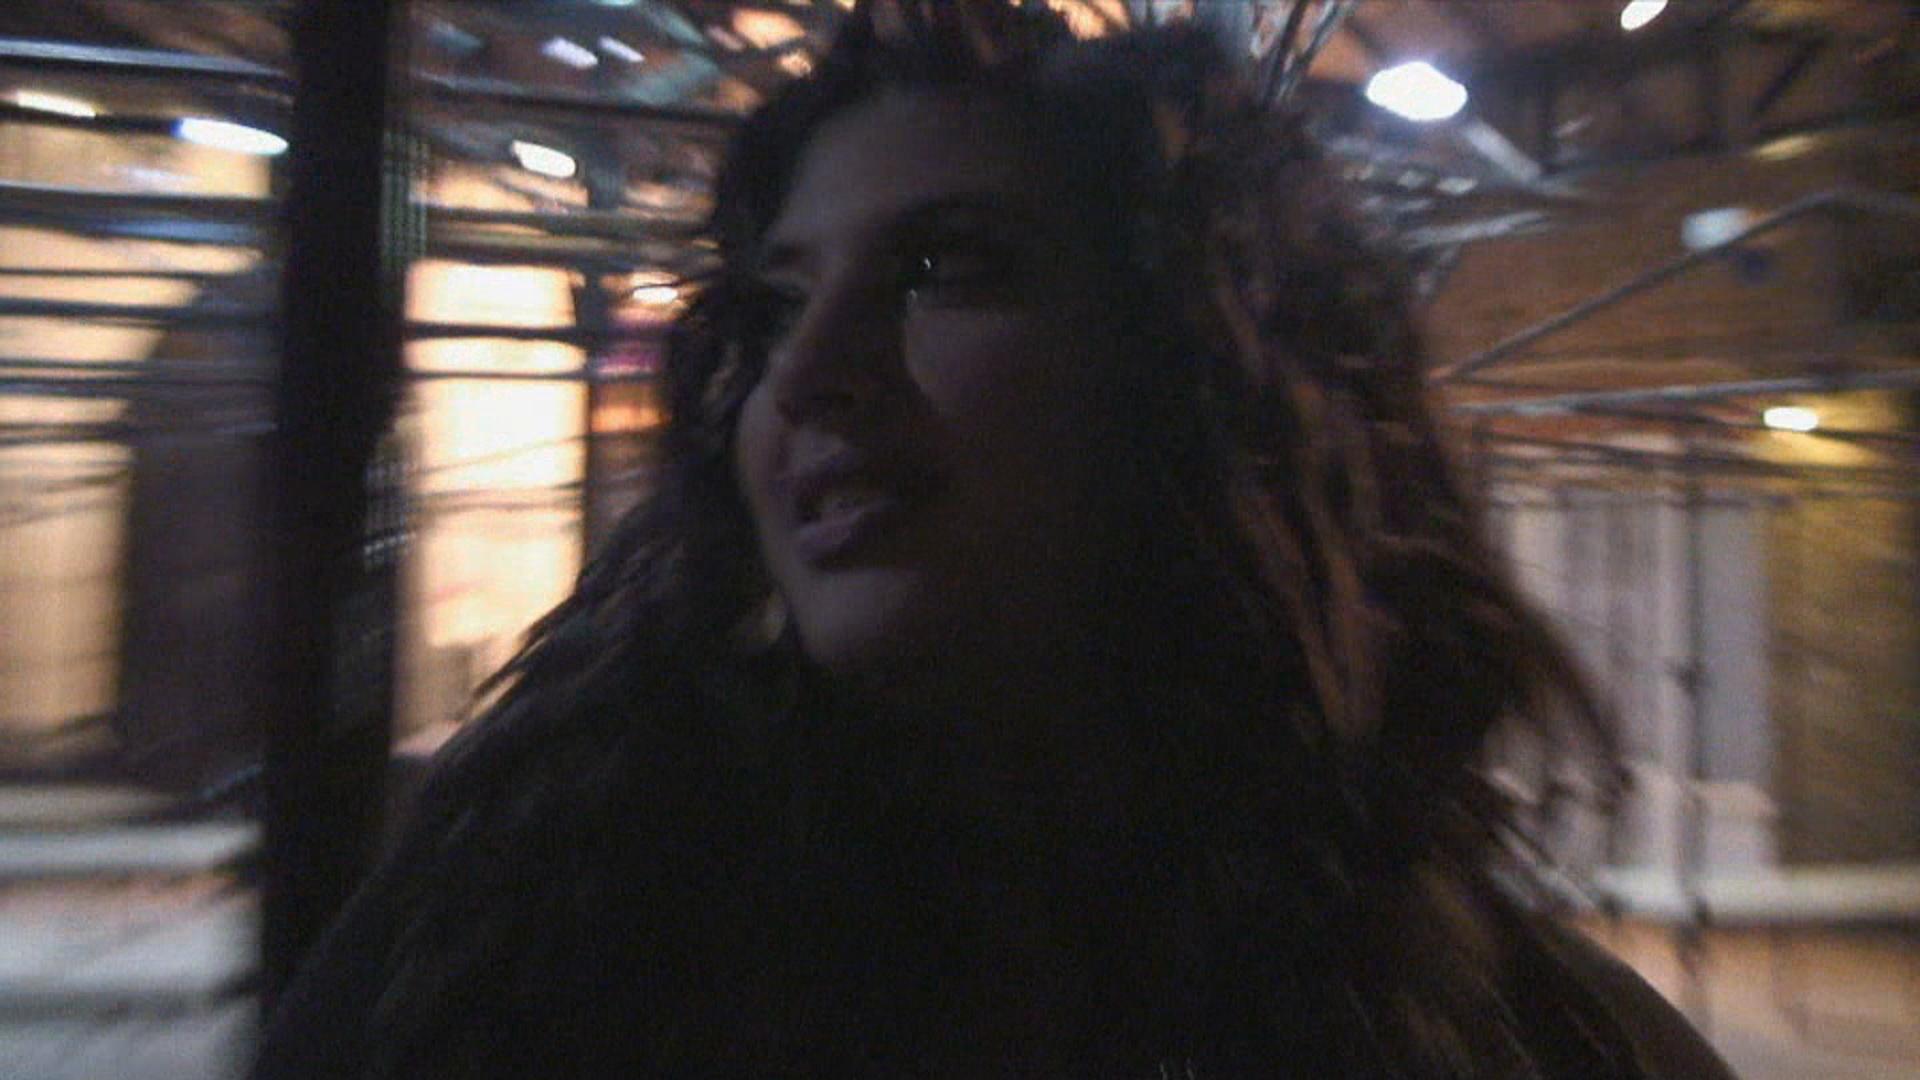 Rohan Quine, 'The Imagination Thief' - film 'EVELYN 62-39-32-84-100', still 13